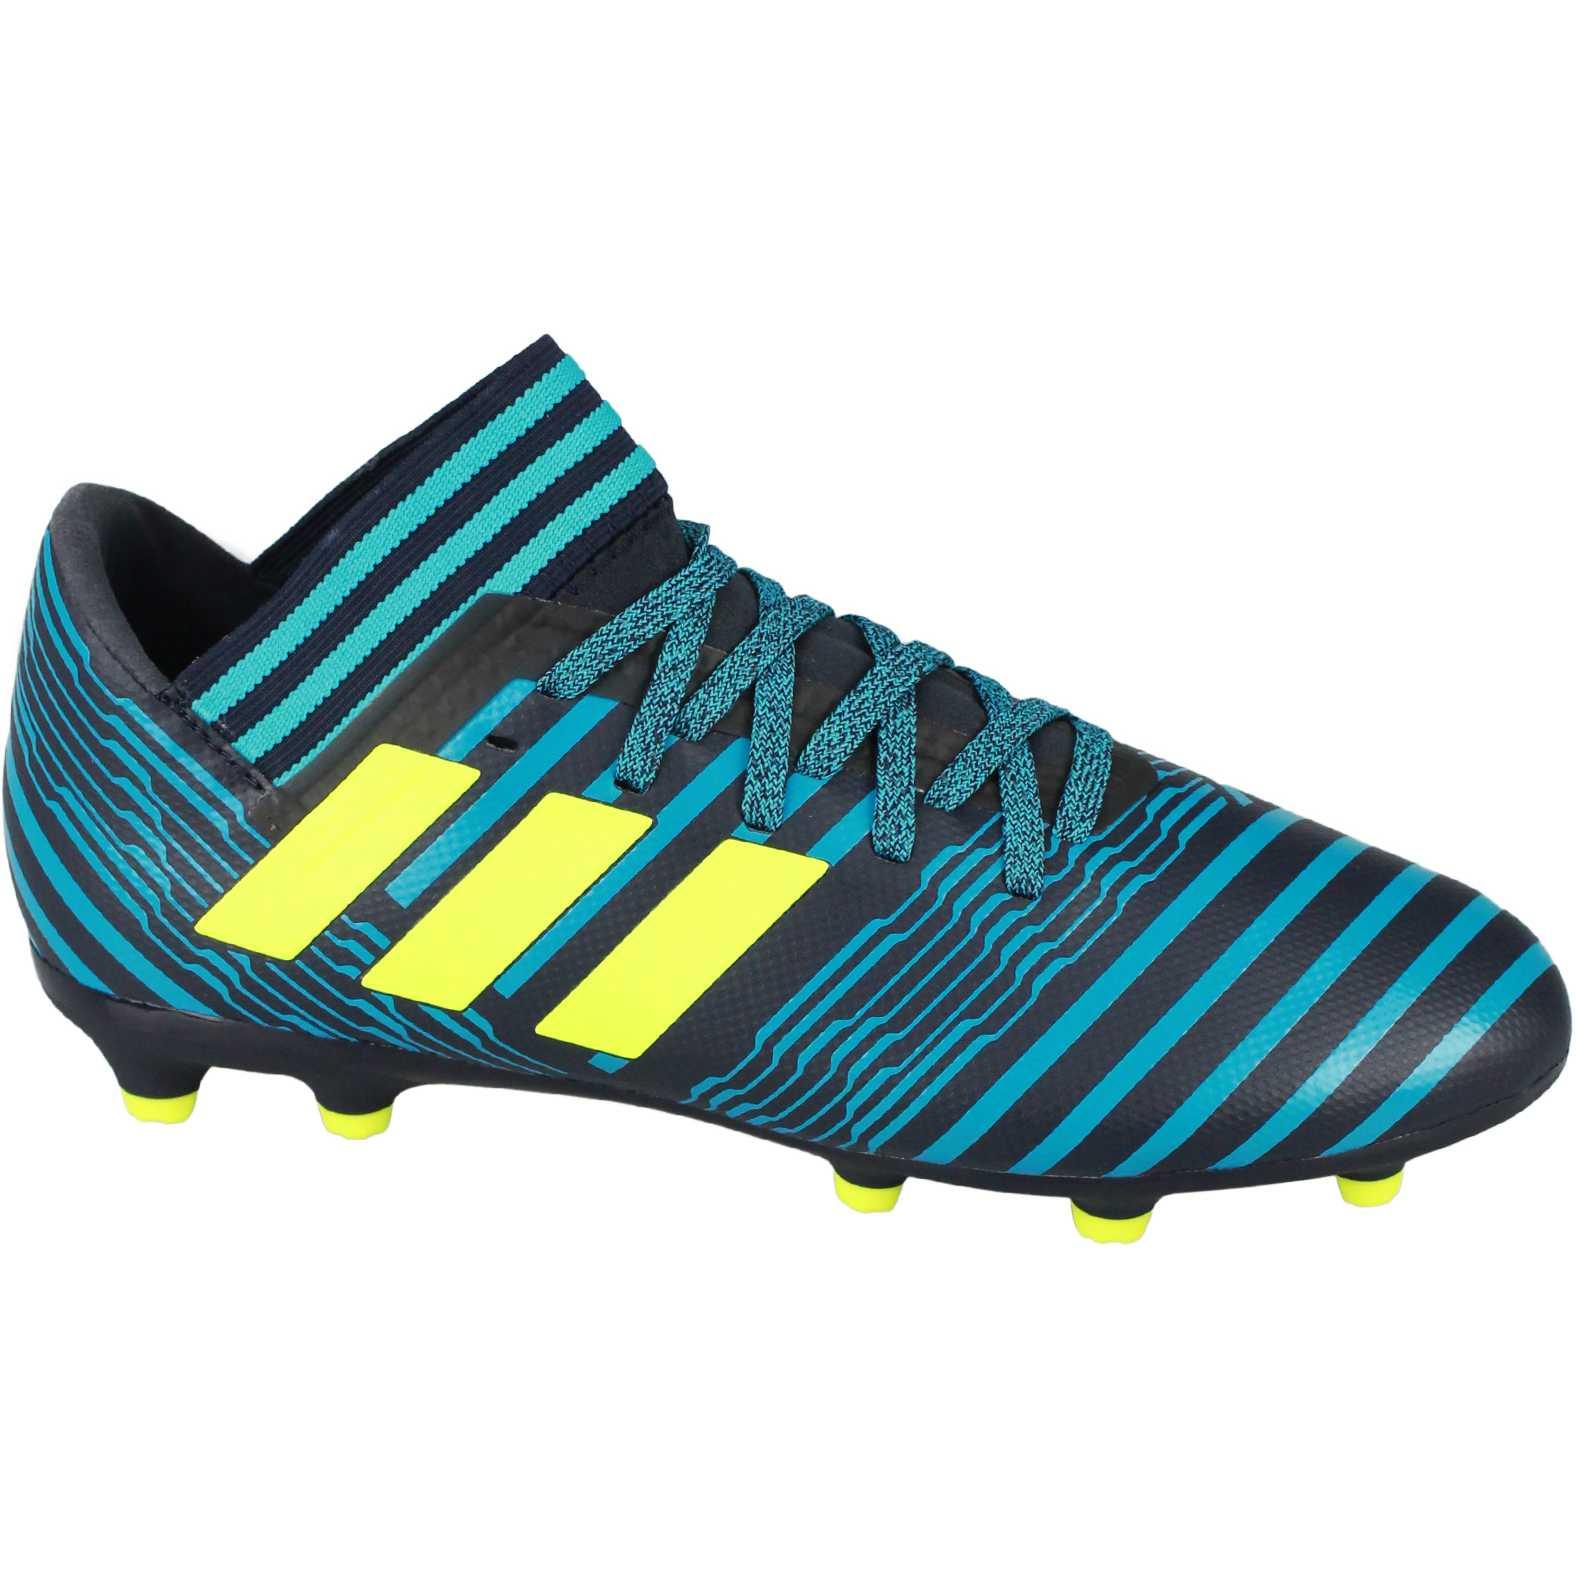 Ghete de fotbal copii adidas Performance Nemeziz 173 Firm Ground S82427